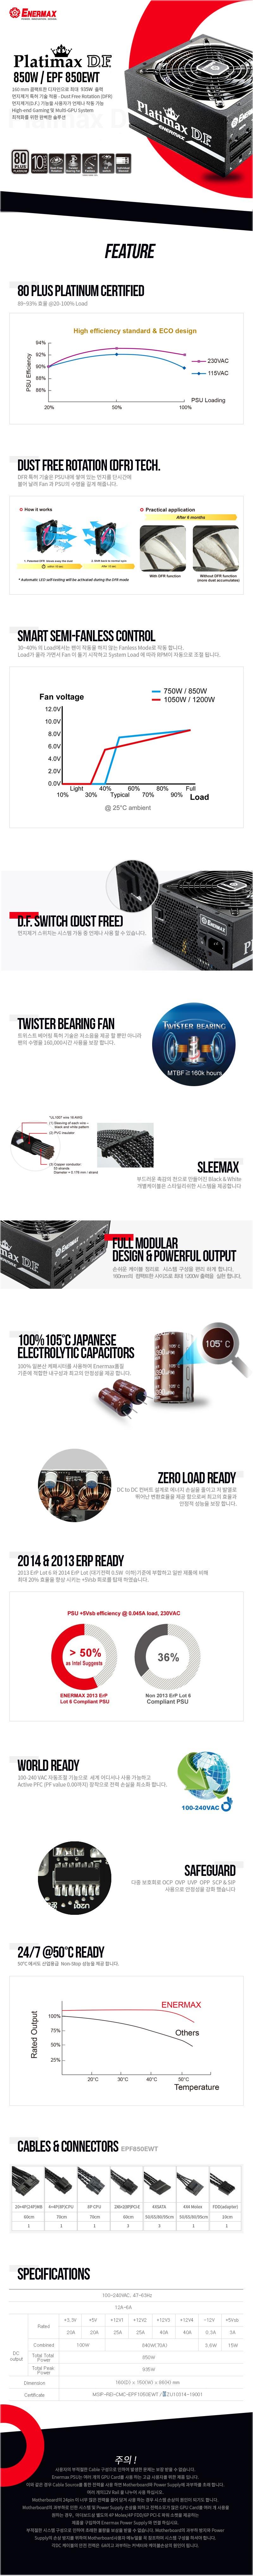 Enermax  Platimax D.F. EPF850EWT 80Plus Platinum Full Modular